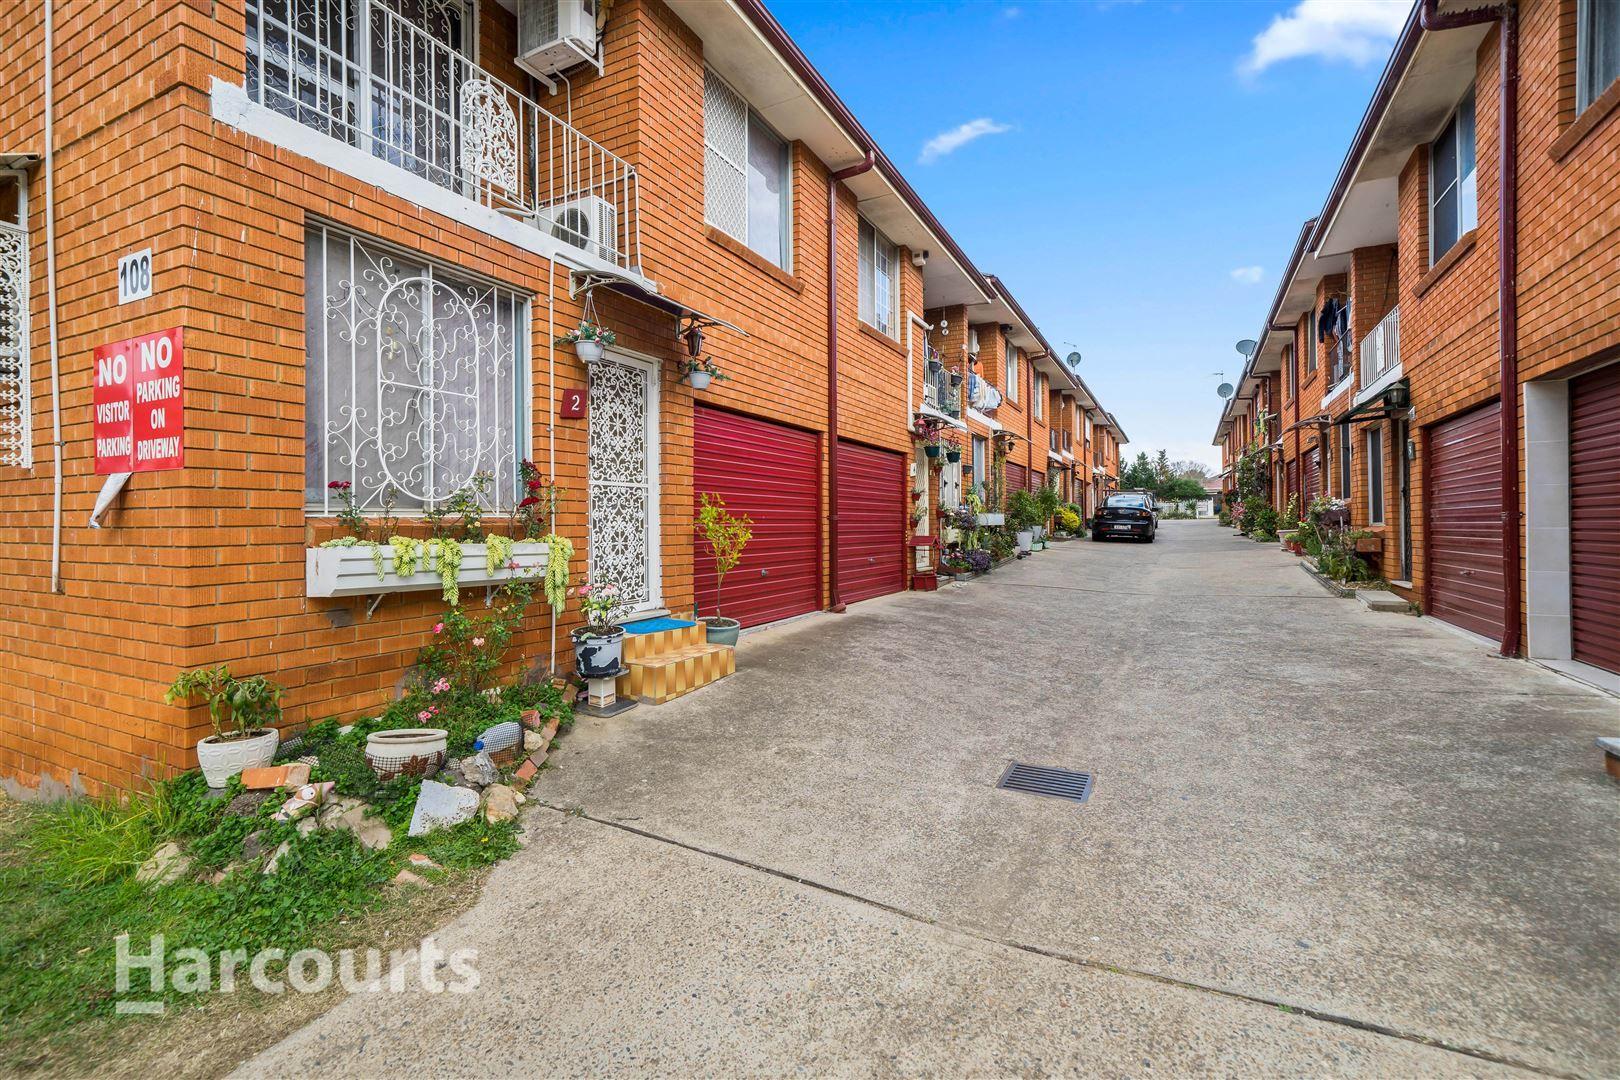 10/108 Longfield Street, Cabramatta NSW 2166, Image 0